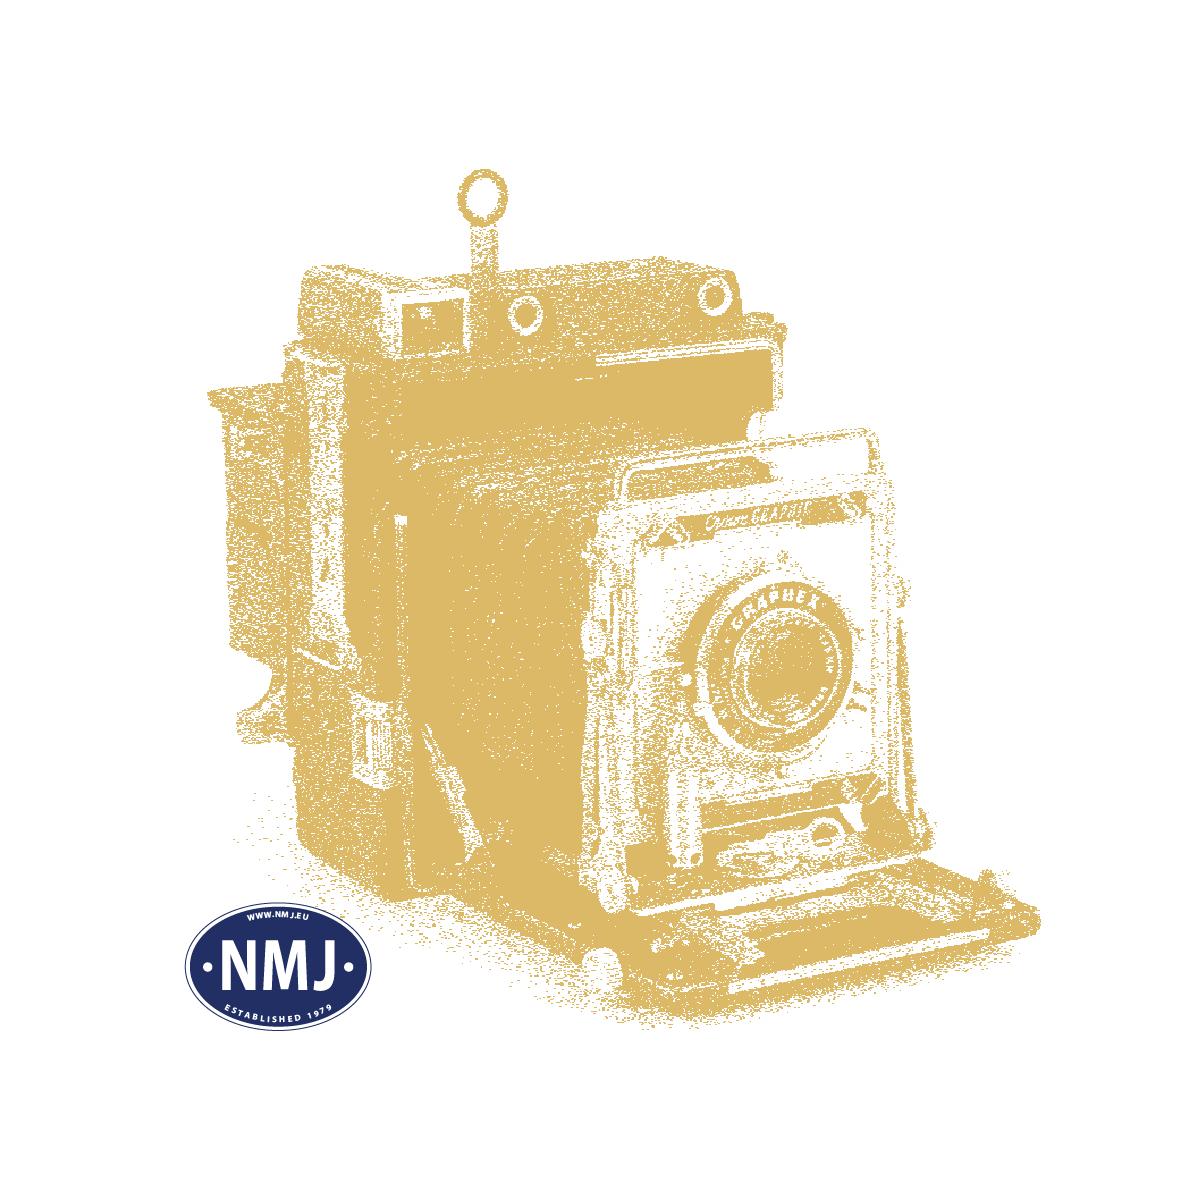 NMJS21a176 - NMJ Superline Modell der NSB Schlepptenderlok Type 21a 176